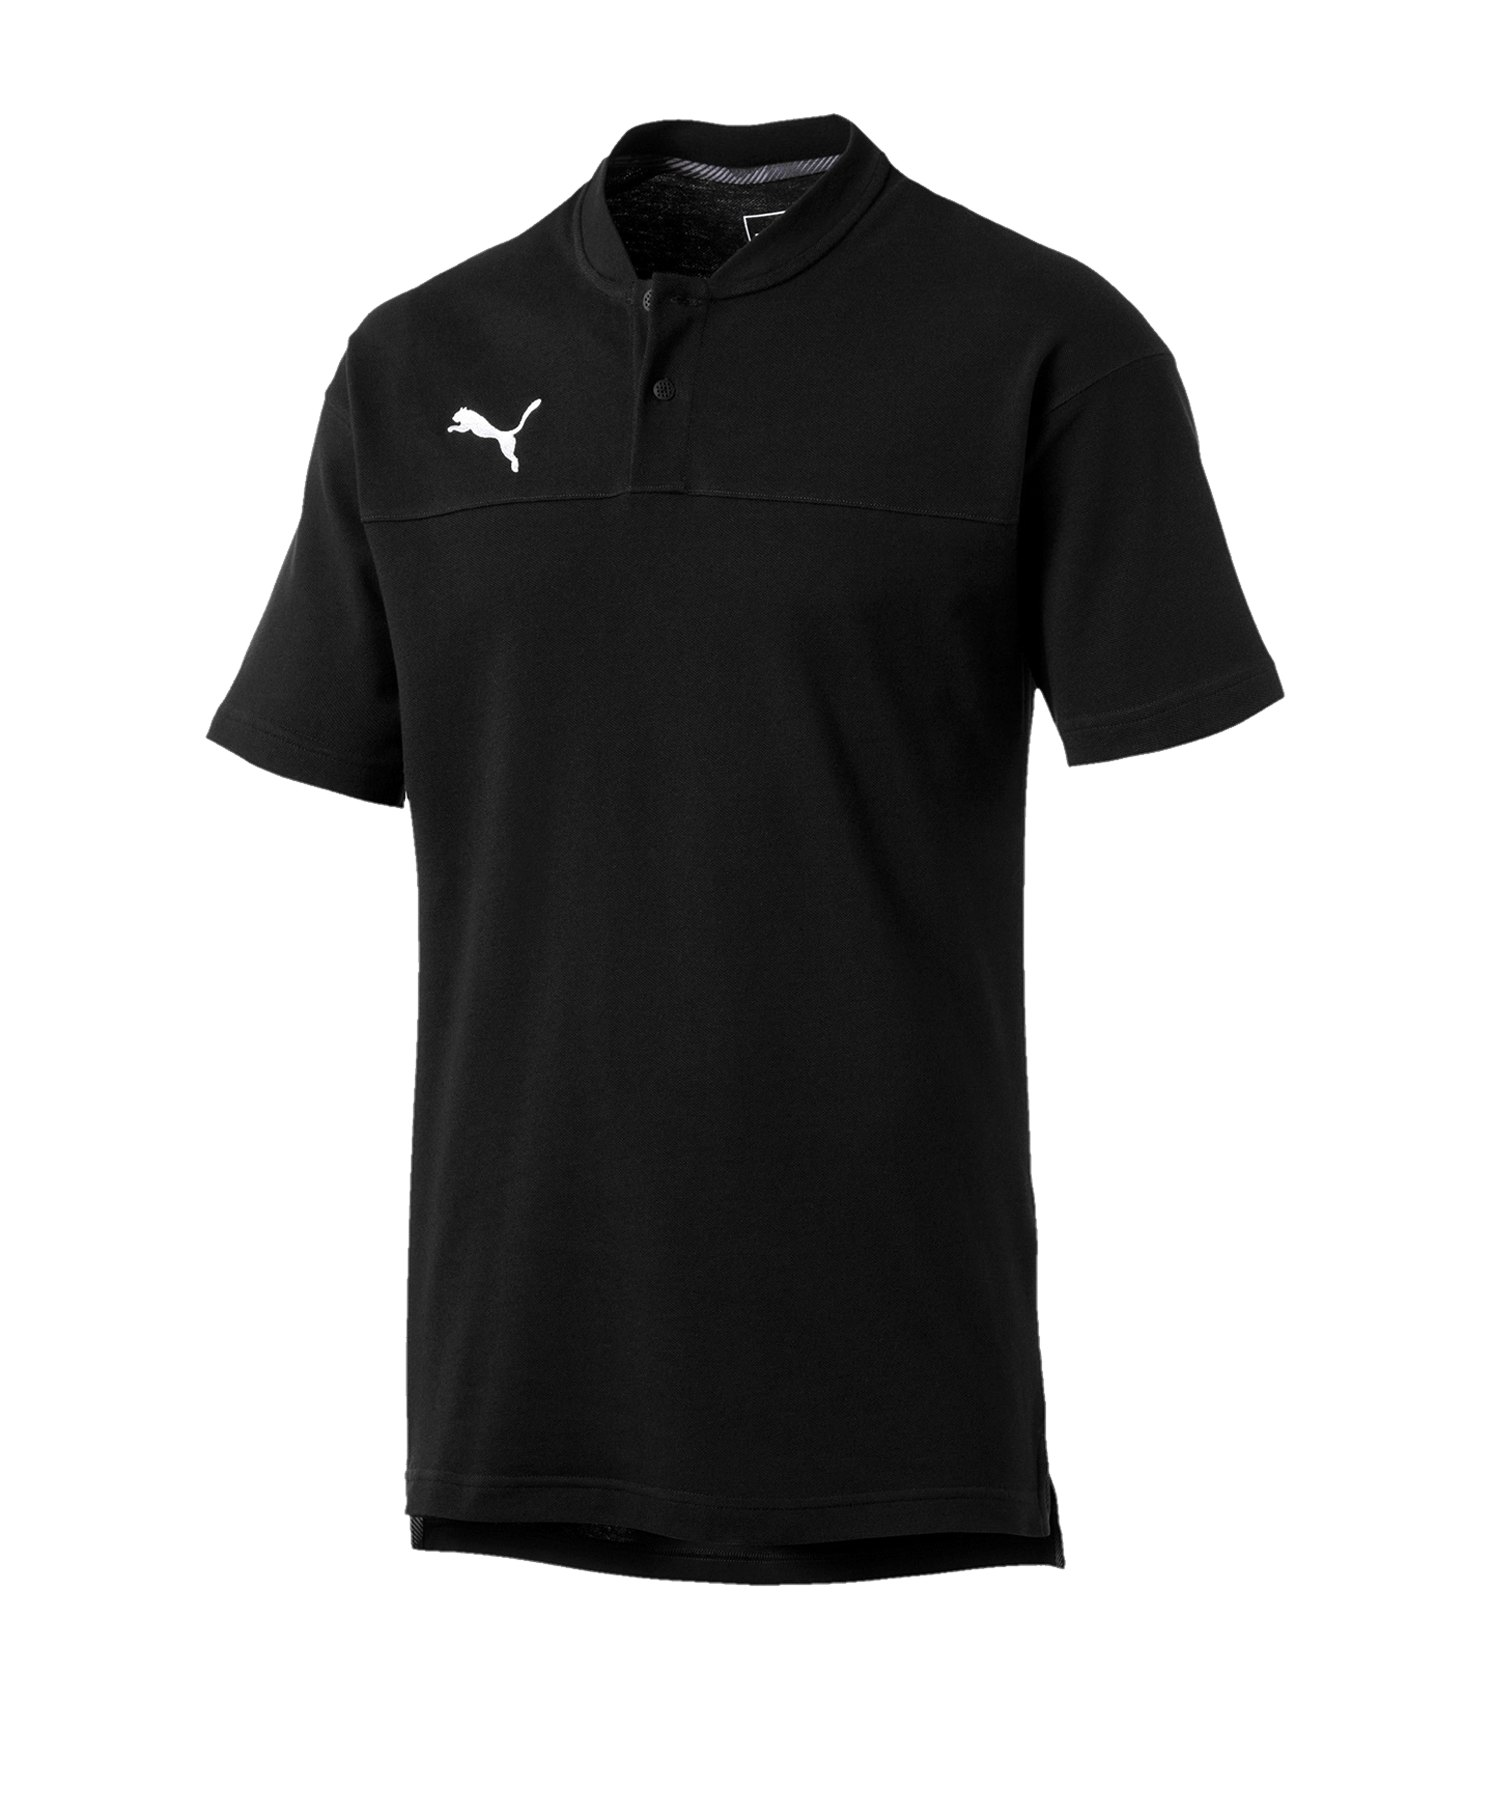 PUMA CUP Casual Poloshirt Schwarz F03 - schwarz